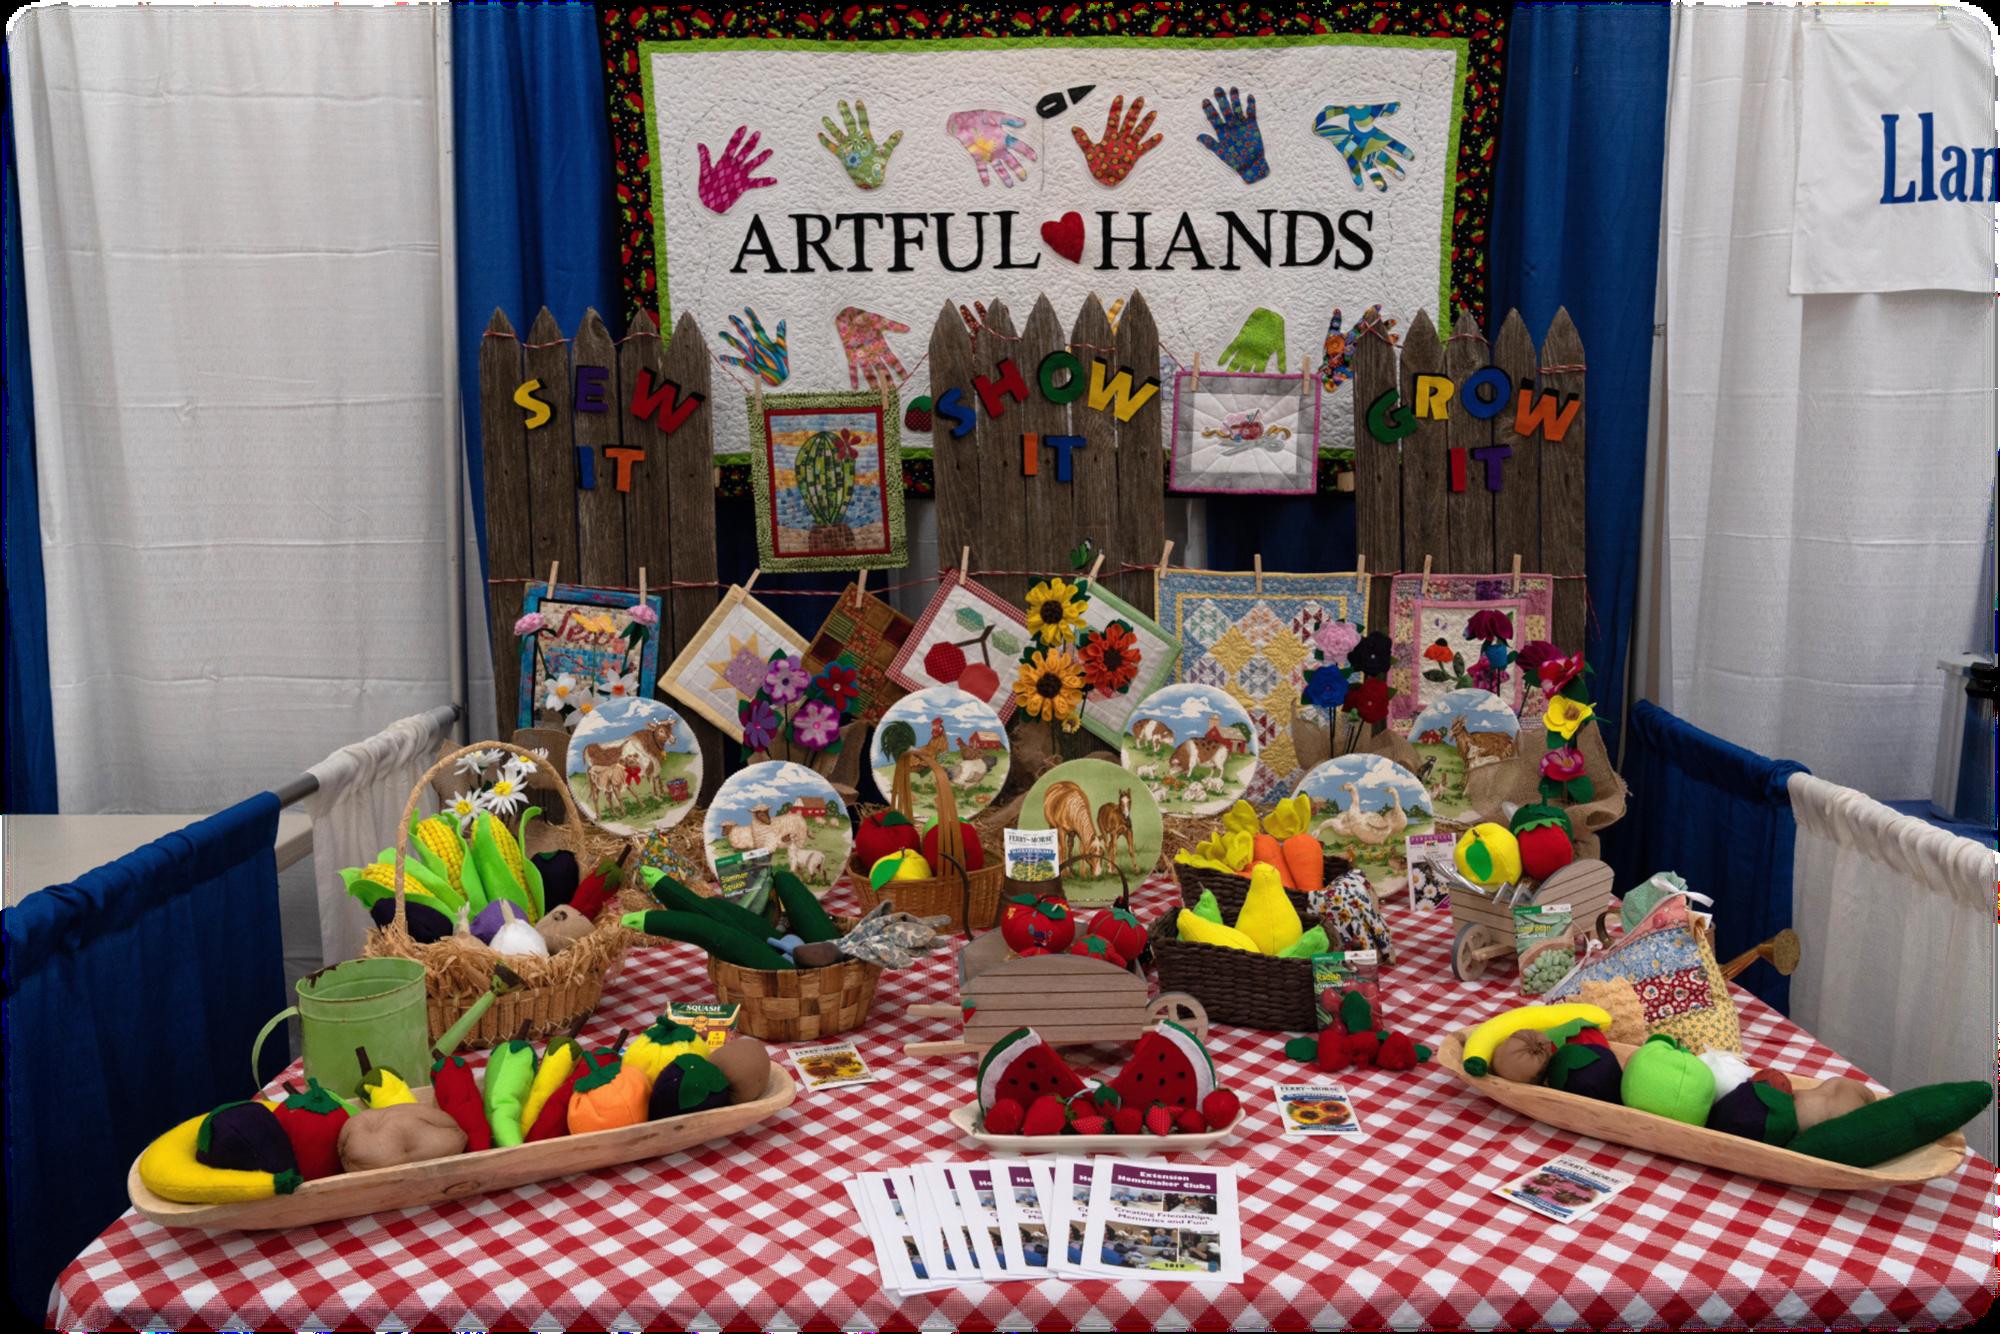 Creative Arts & Community Booths